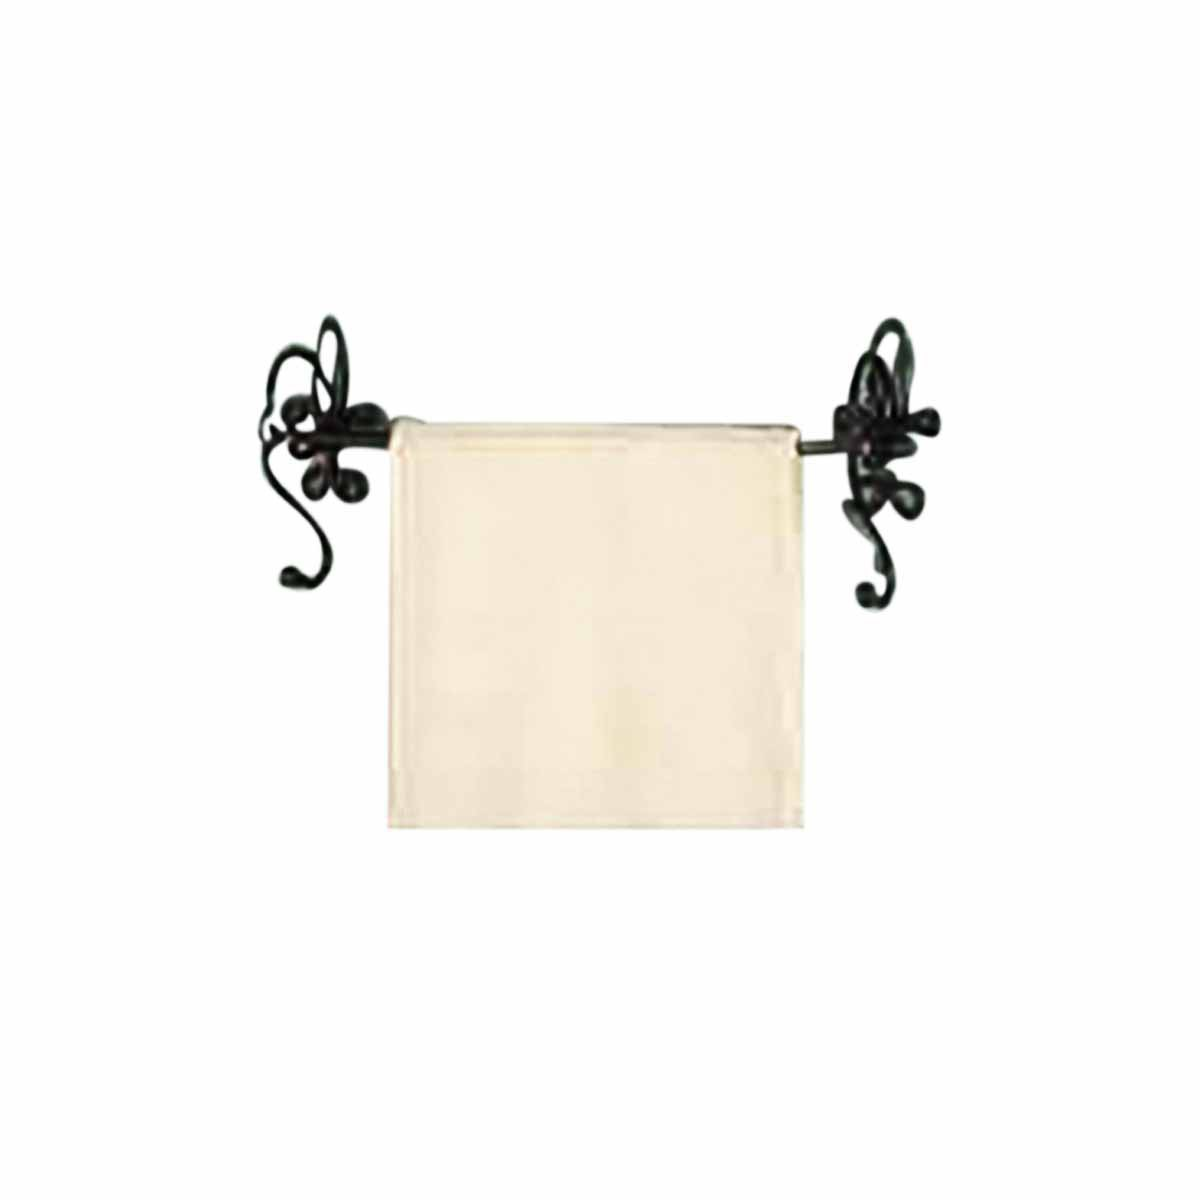 towel bar nickel 18 bar bathroom. Black Bedroom Furniture Sets. Home Design Ideas